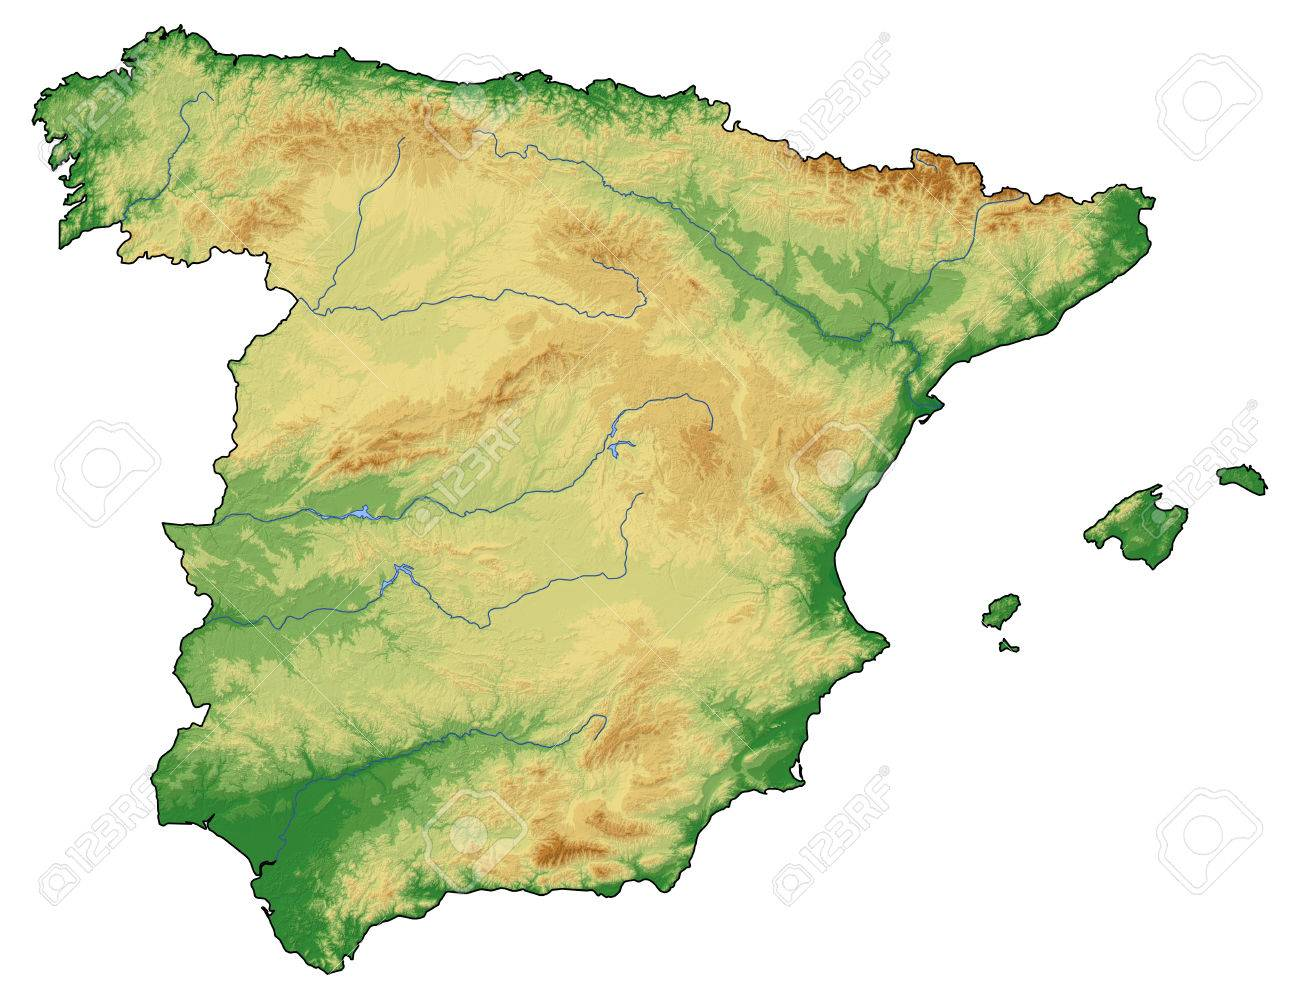 Carte Andalousie Relief.Carte De L Espagne Relief Avec Relief Ombre